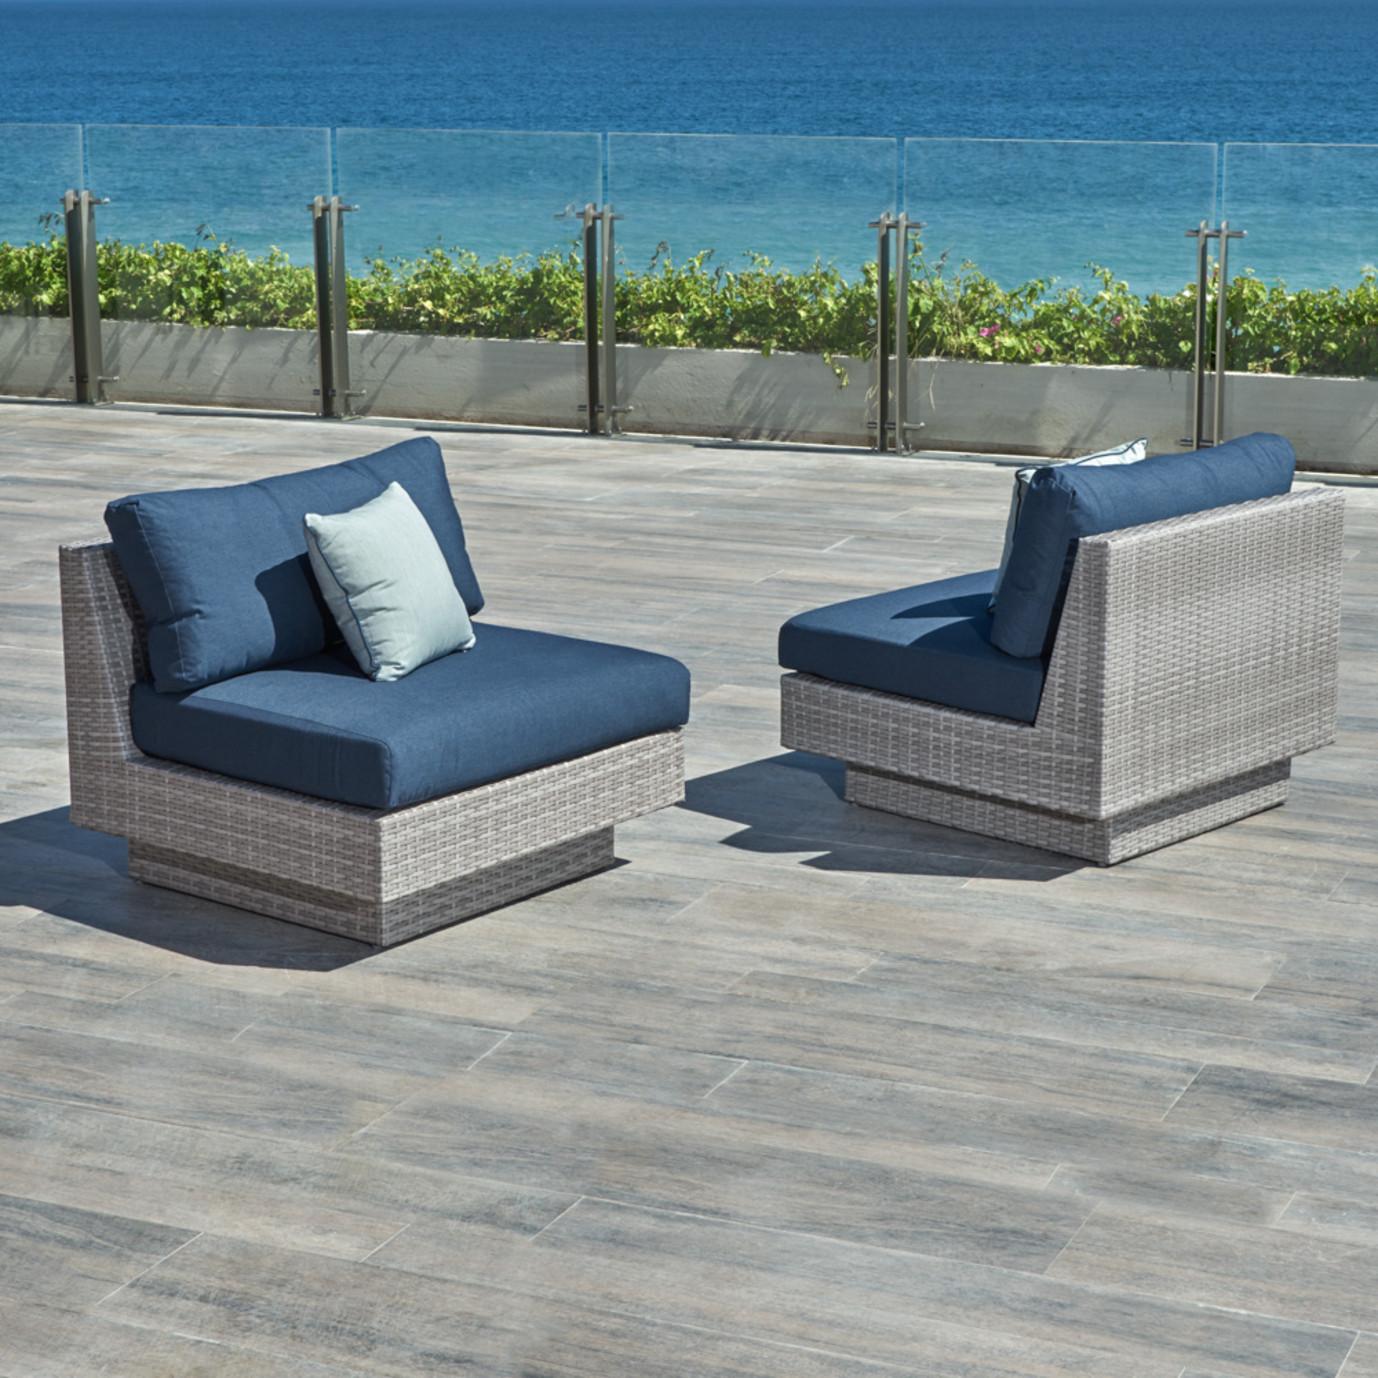 Portofino™ Comfort Armless Chairs - Laguna Blue